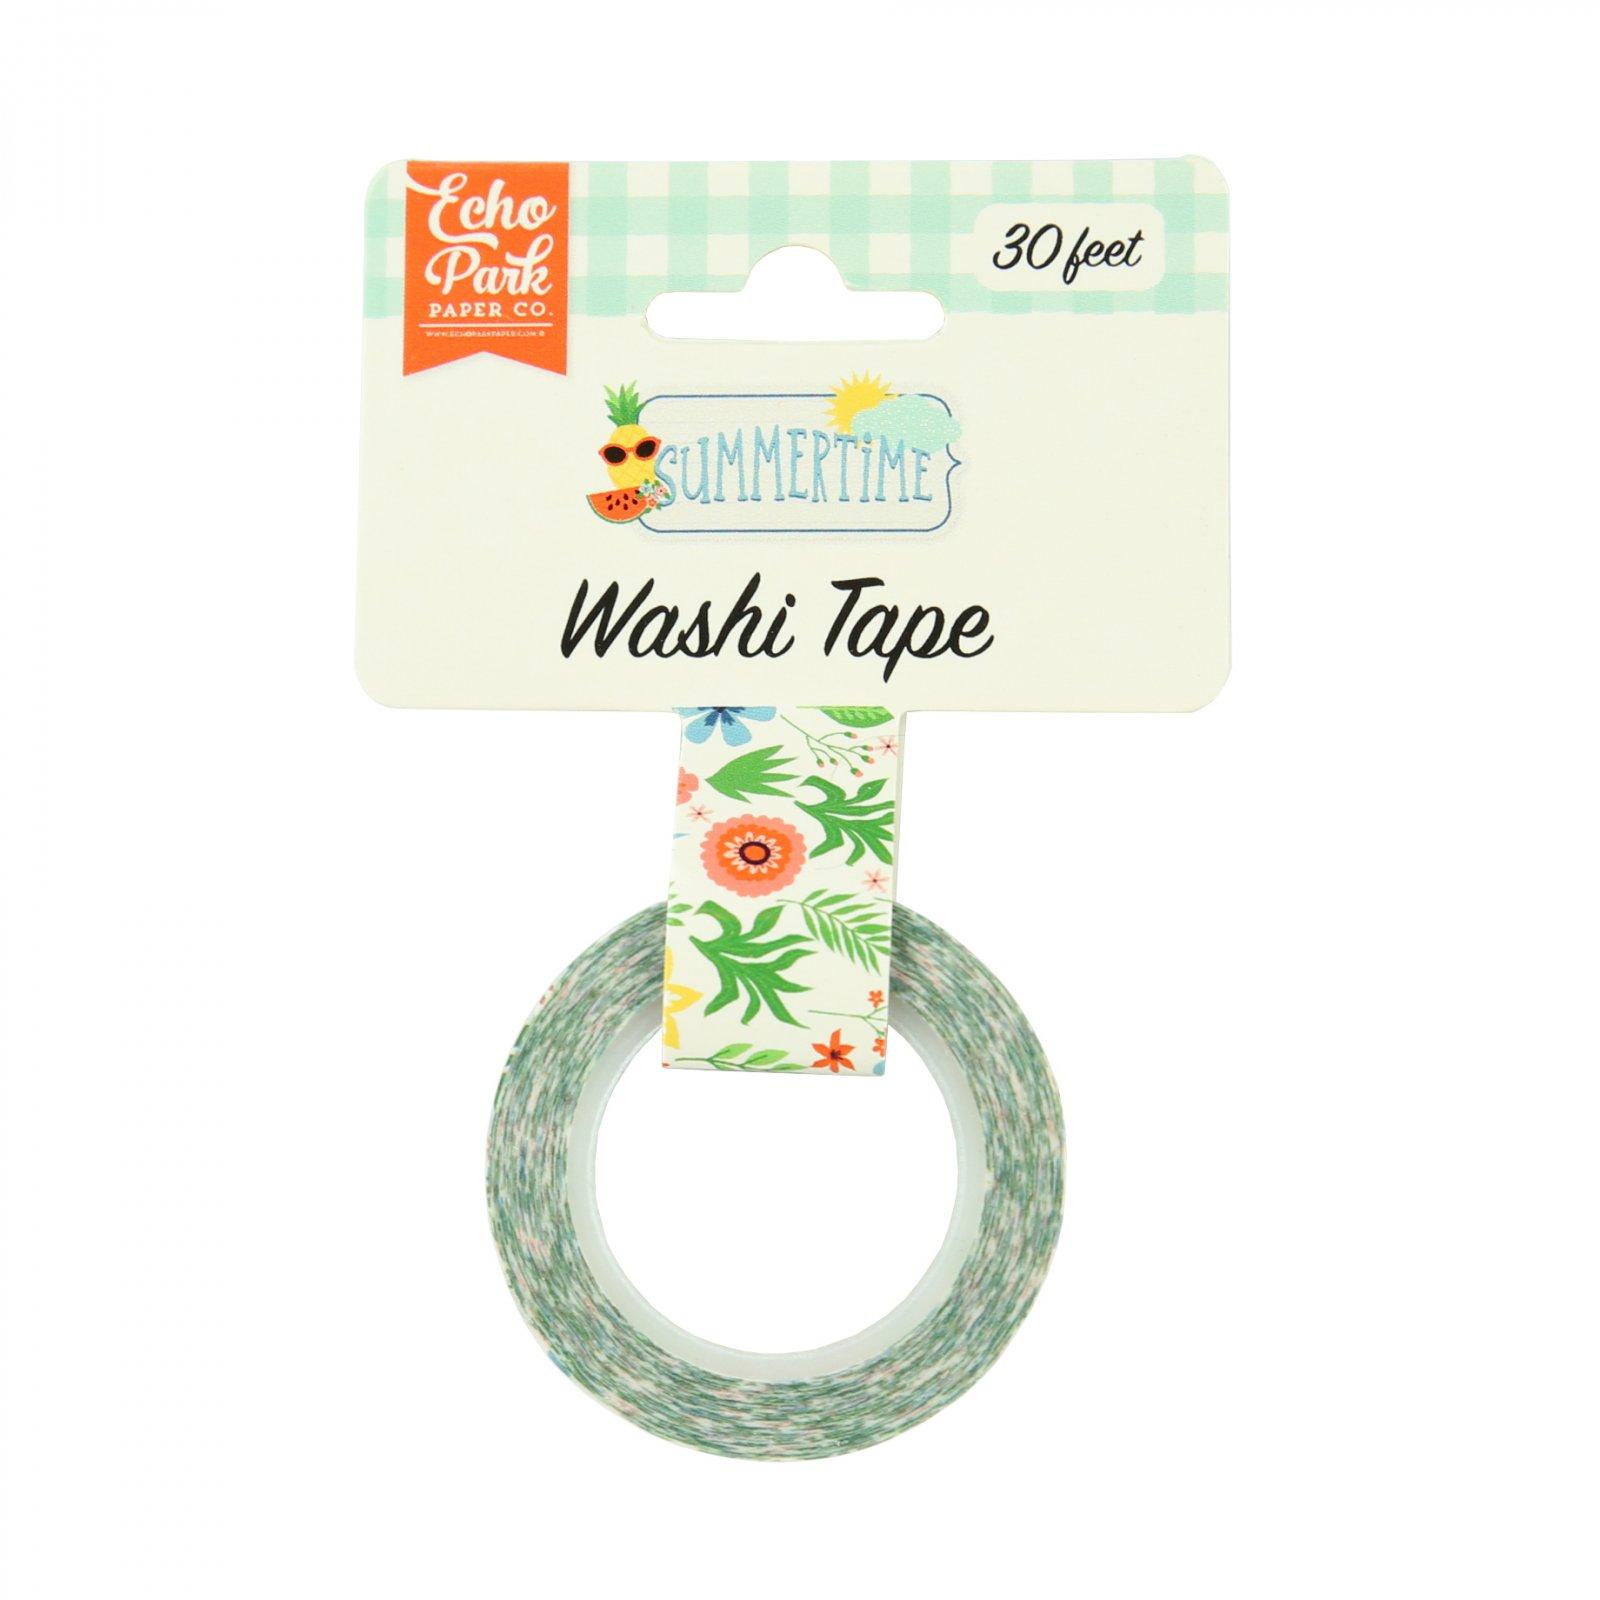 ^Echo Park - Washi Tape - Summertime, Summer Flowers